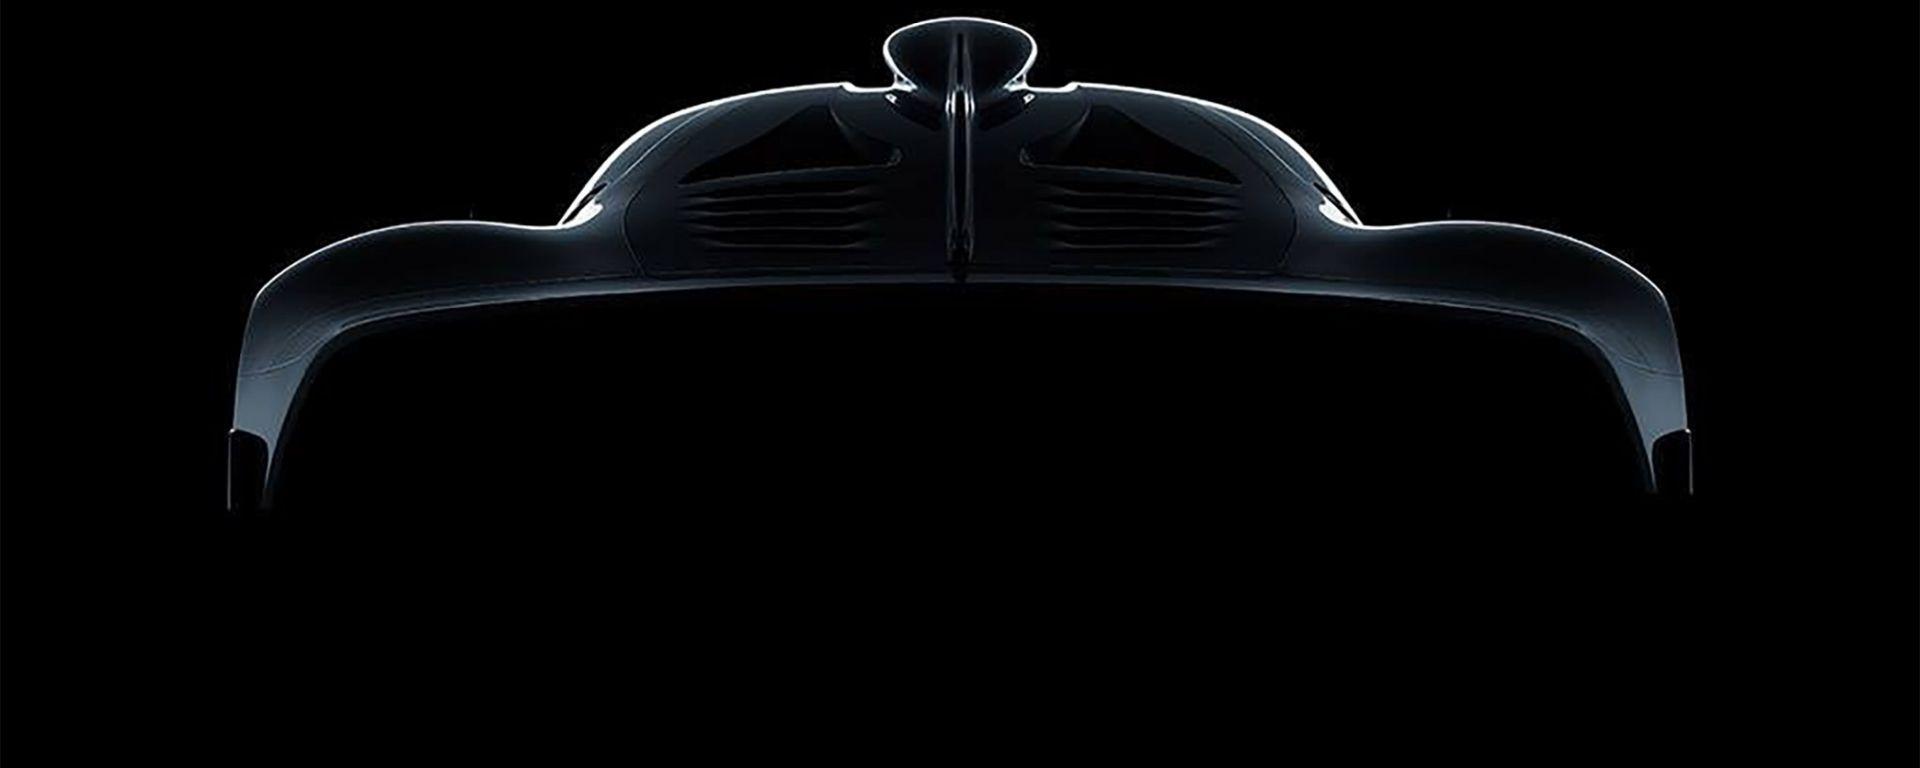 Mercedes-AMG Project One: il secondo teaser della hypercar tedesca